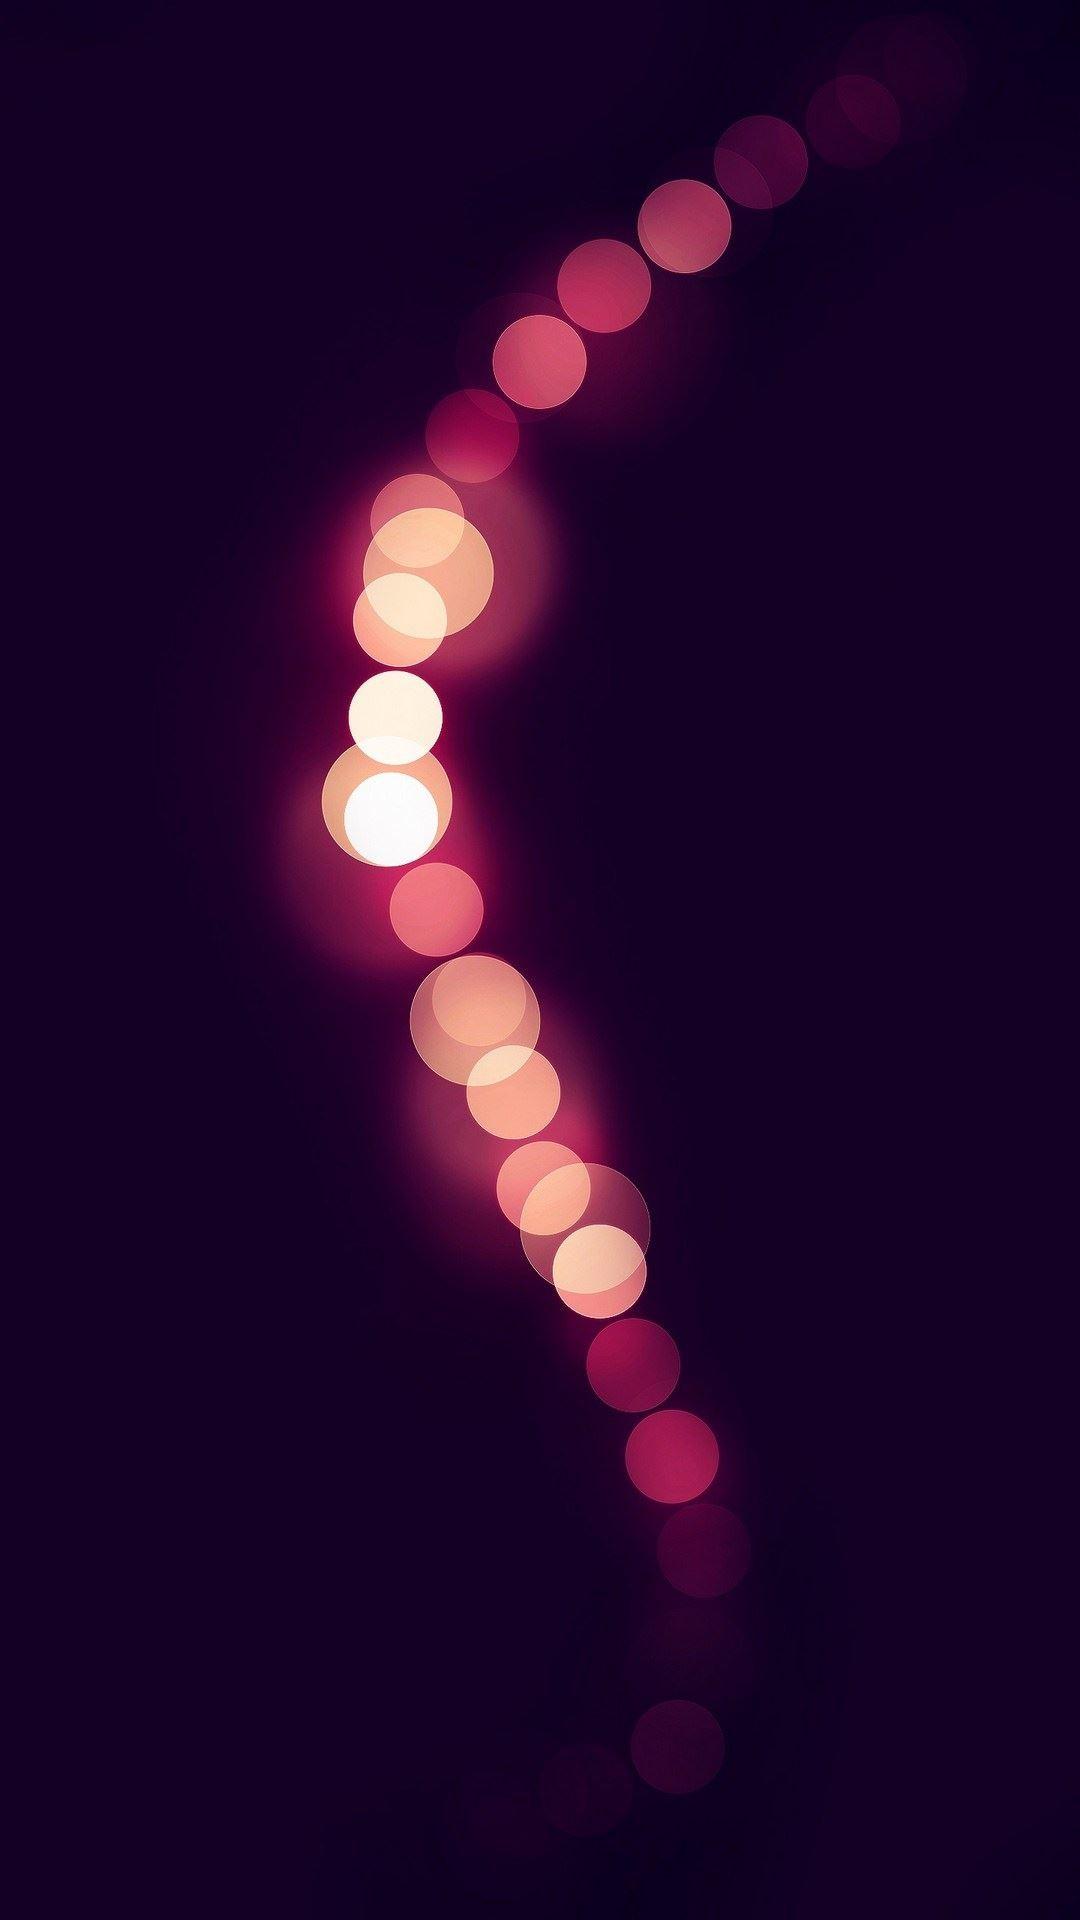 Pink Light Circles Bokeh iPhone 6 Plus HD Wallpaper